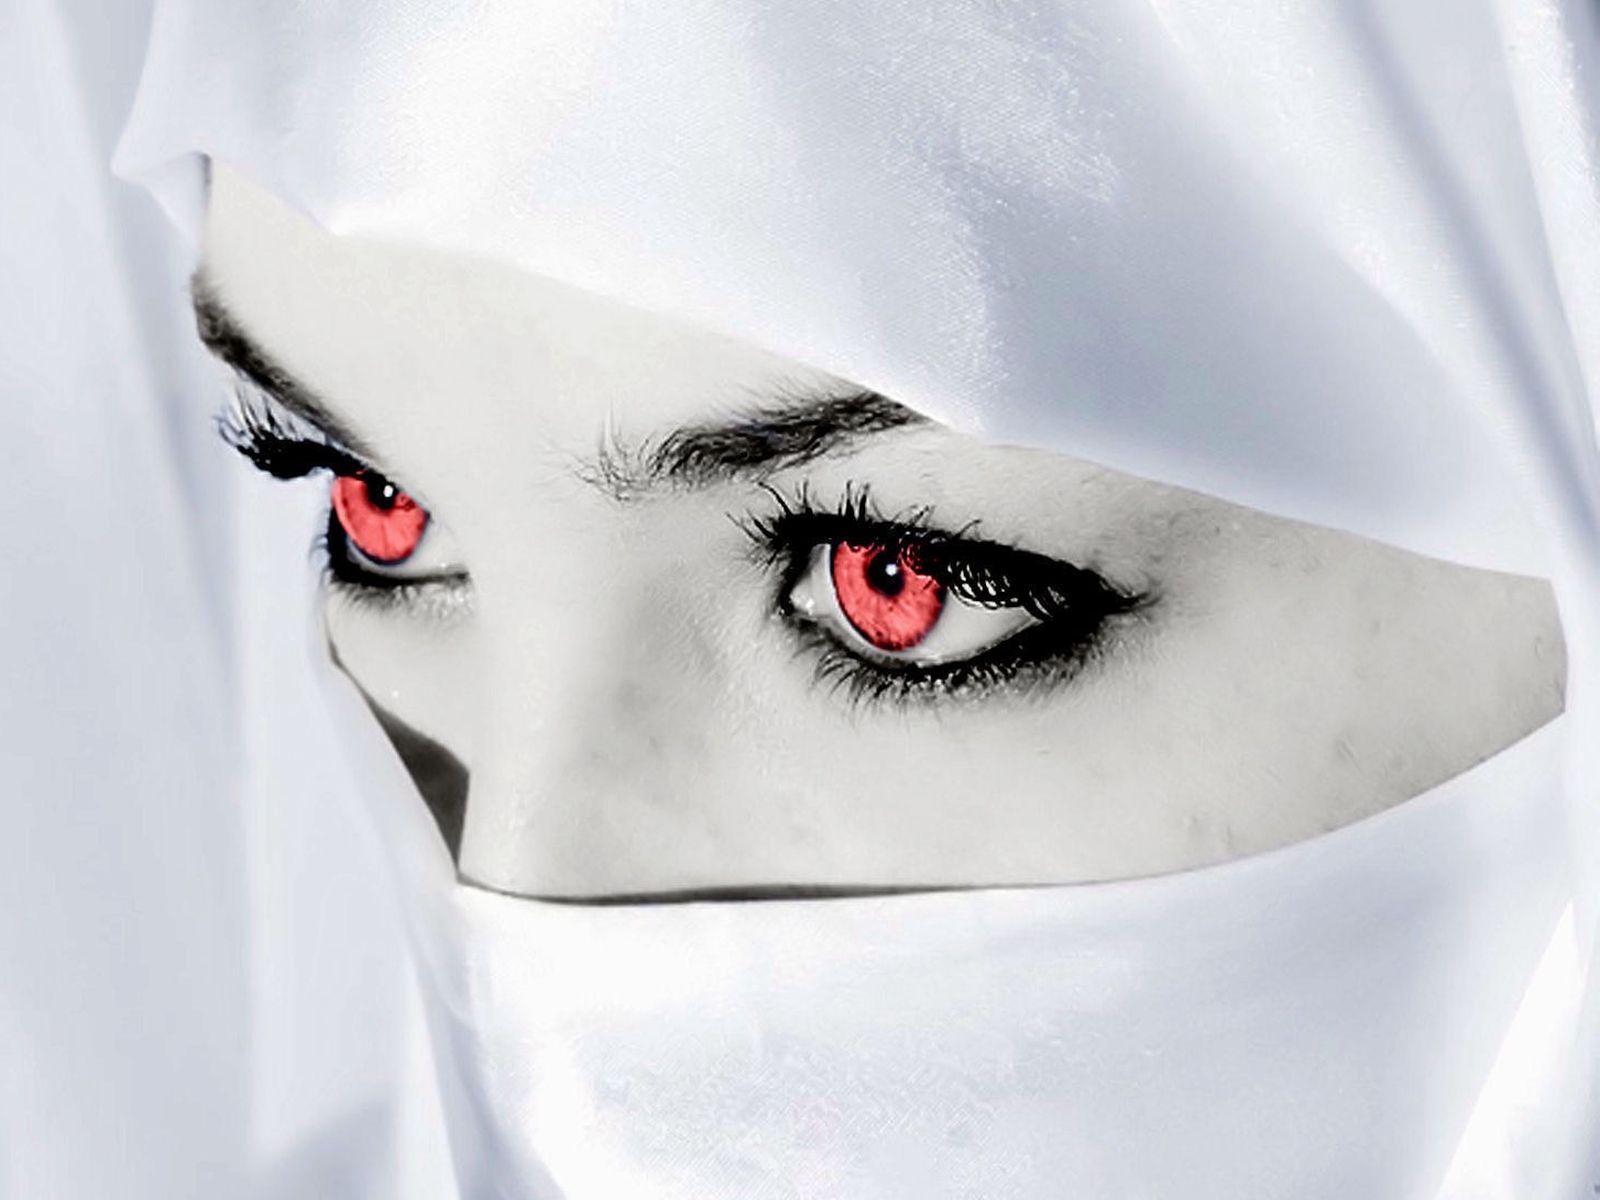 free woman wallpaper,white,face,eyebrow,eye,head